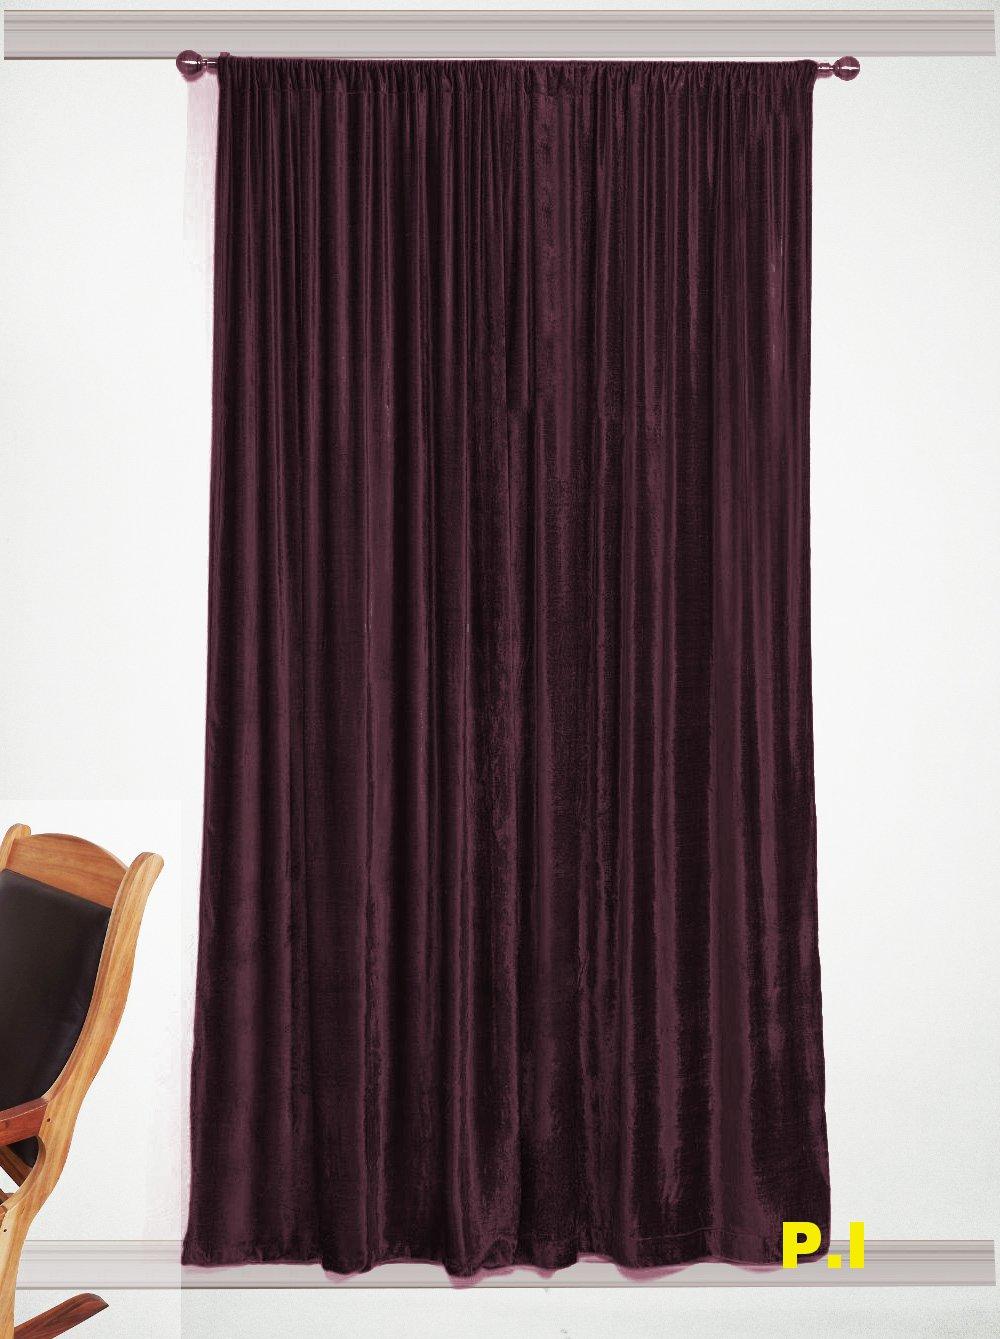 "New Blackout 100% Cotton Velvet Curtain Single Lined Panel 54""W by 108""H - Plum"